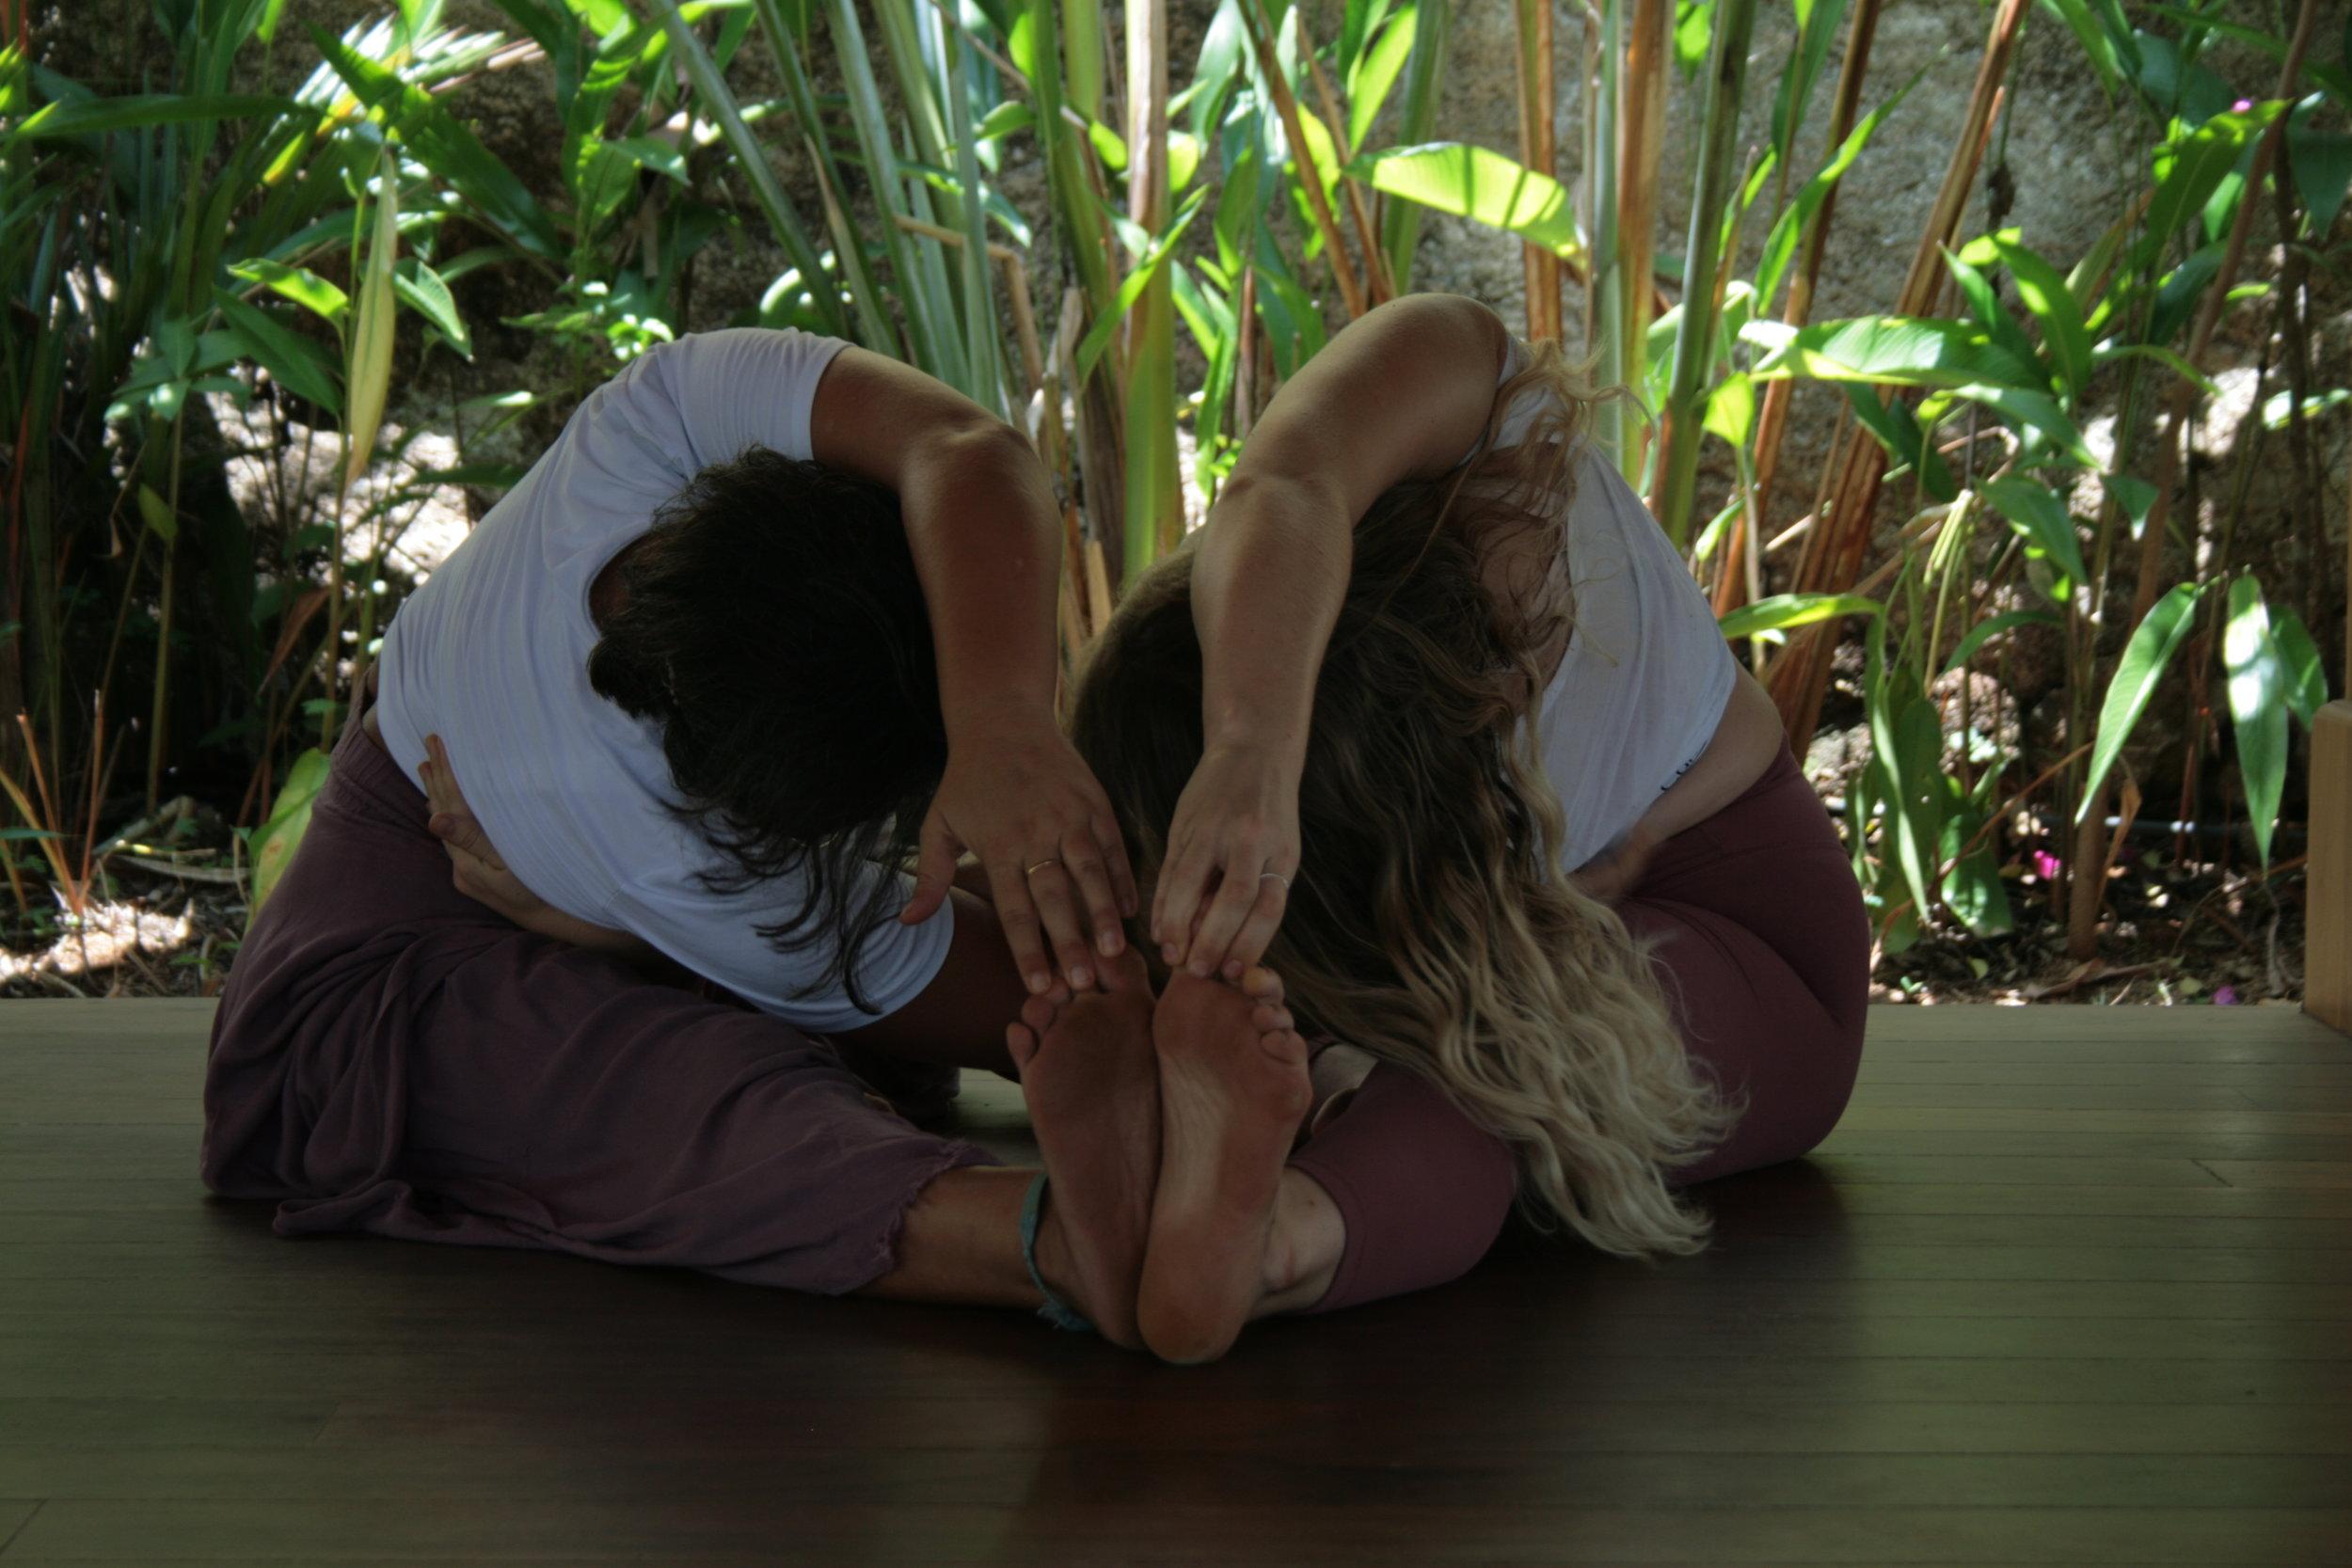 santani wellness yogapose yoga for stress for period yoga for women yin teacher training